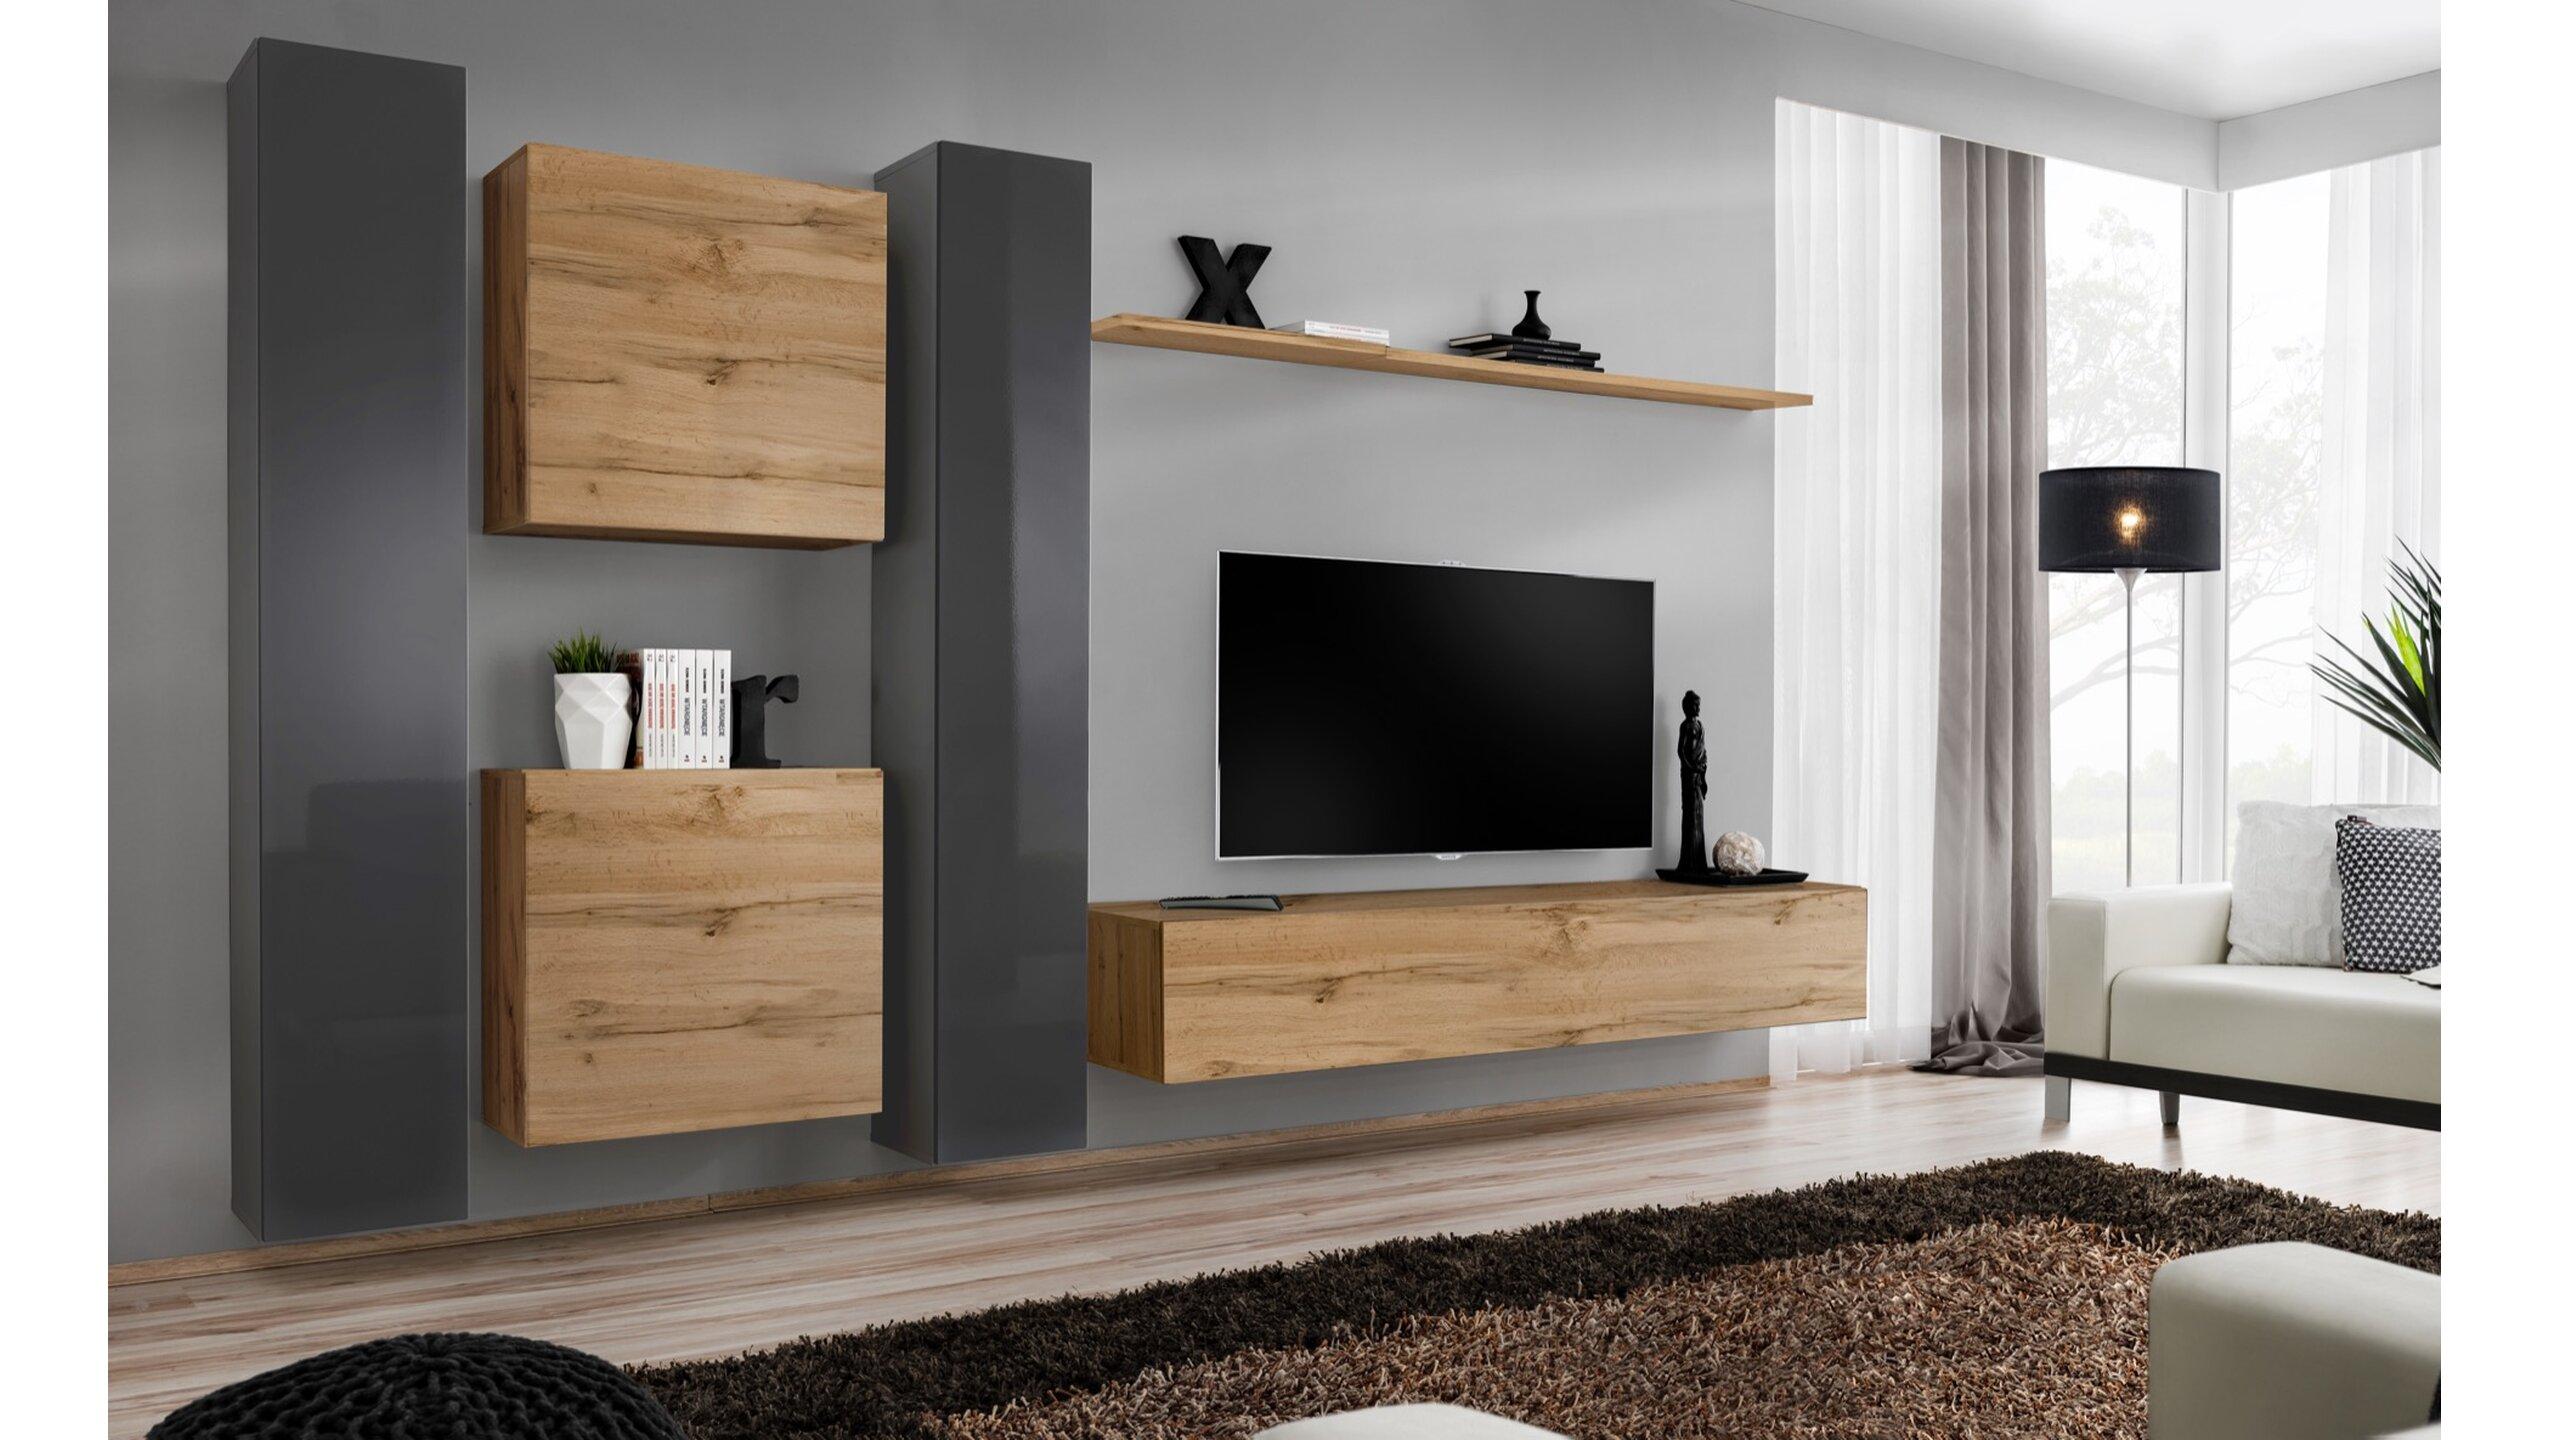 Stylefy Swotch VI Wohnwand Grau Wotan Eiche Grau   Möbel online kaufen » jetzt b